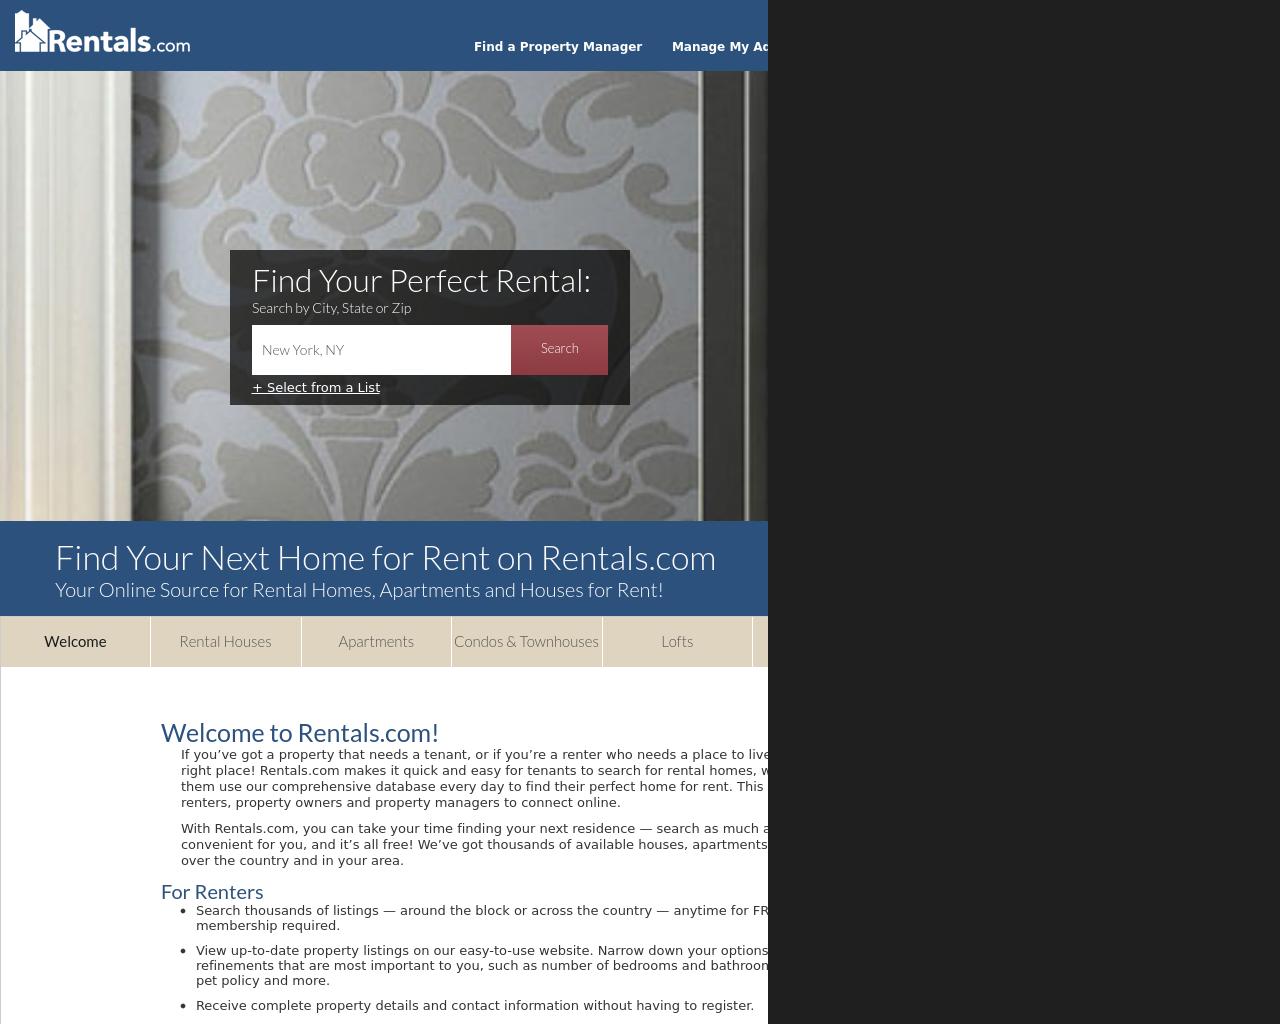 Rentals.com-Advertising-Reviews-Pricing